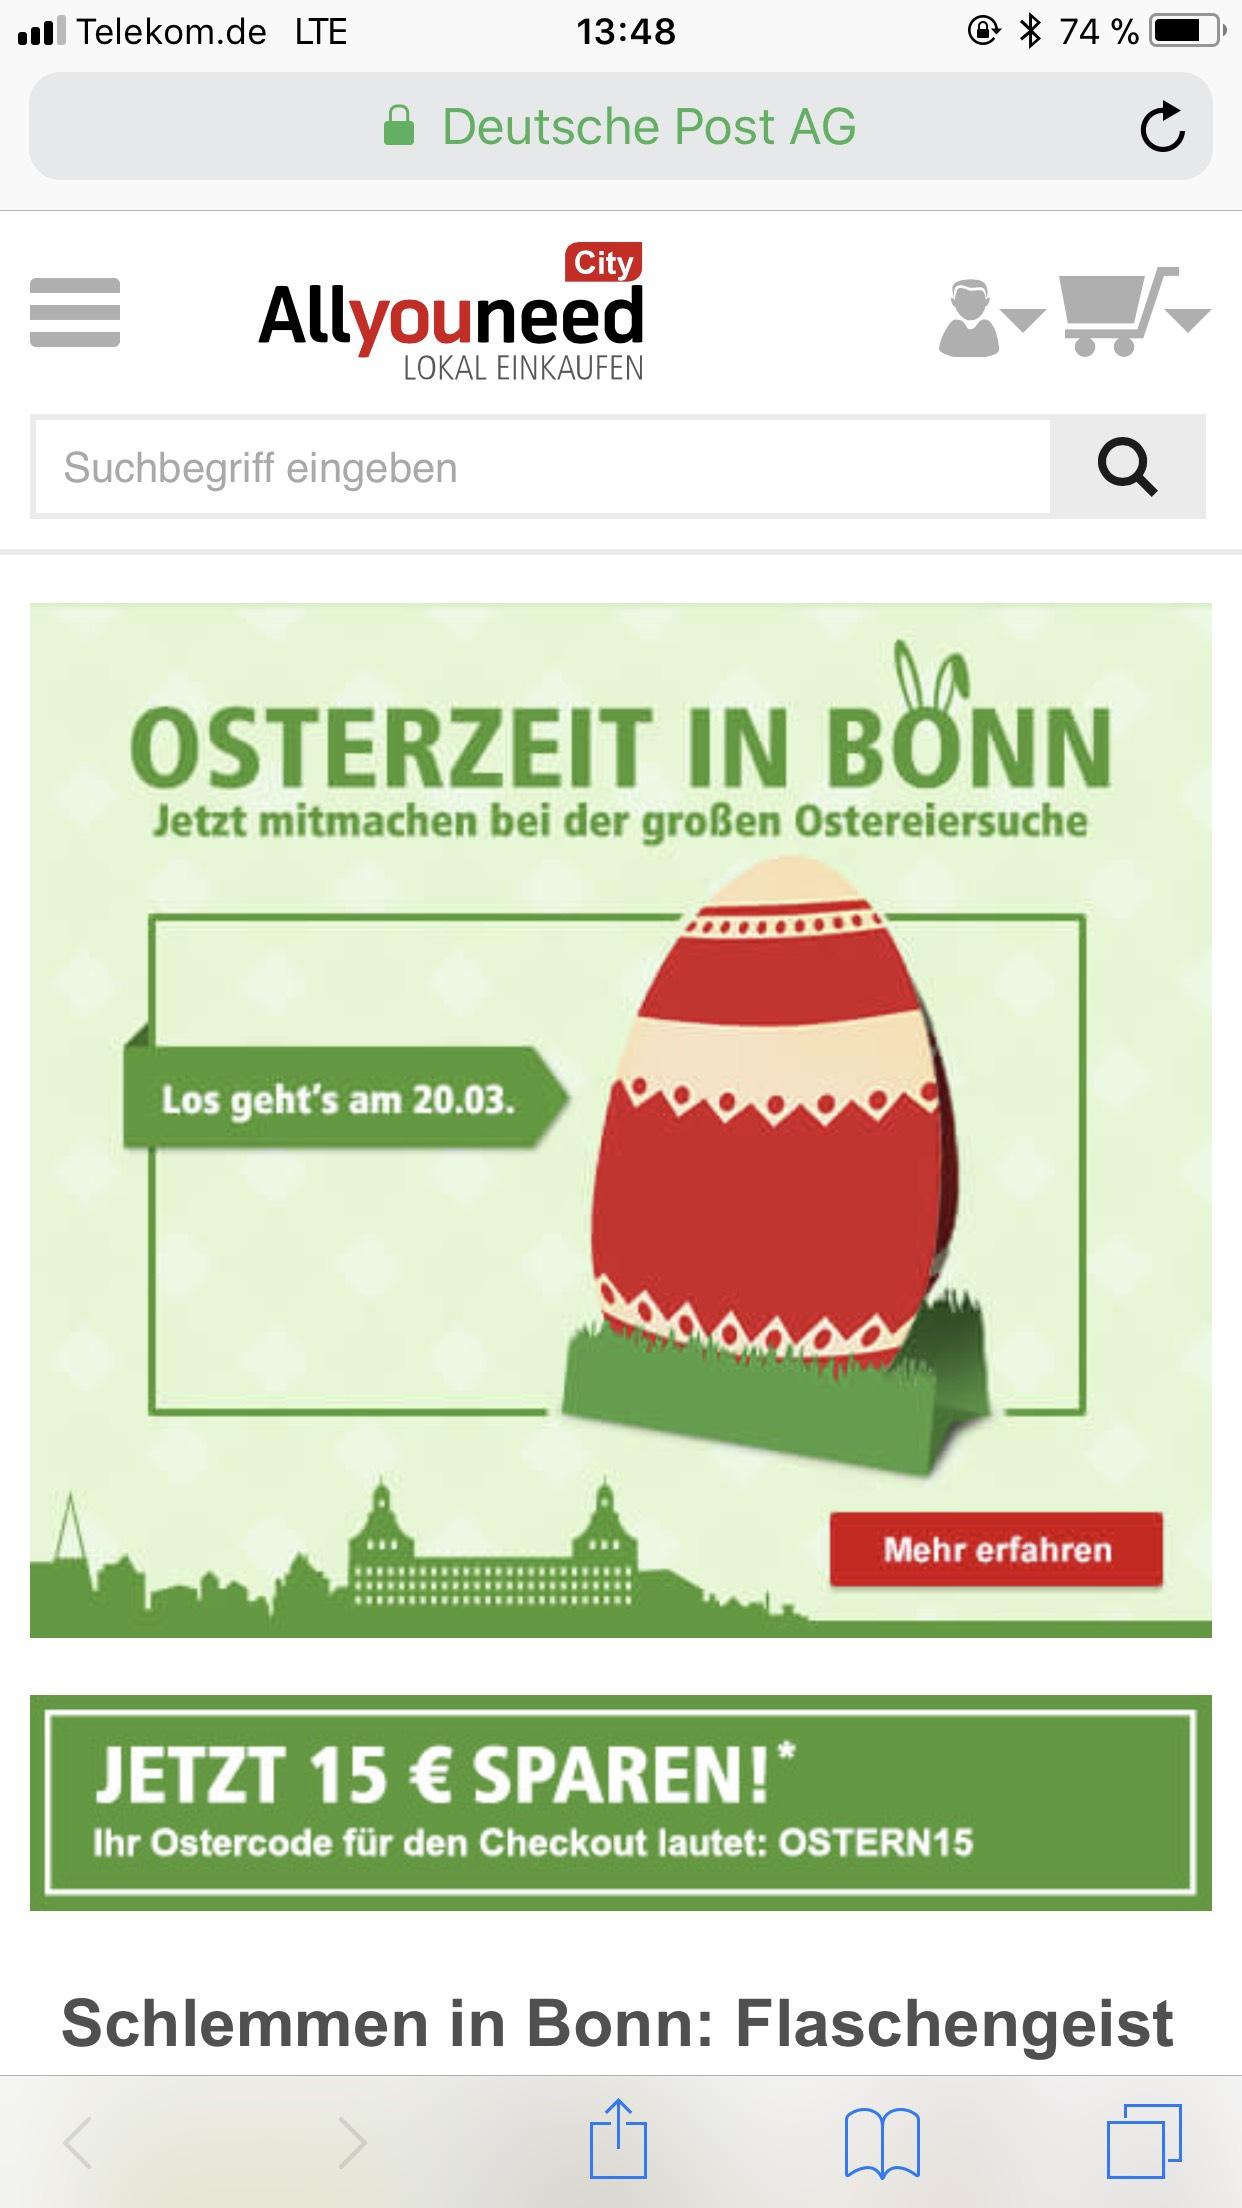 15€ Rabatt durch den OsterCode OSTERN15 | AllyouneedCity